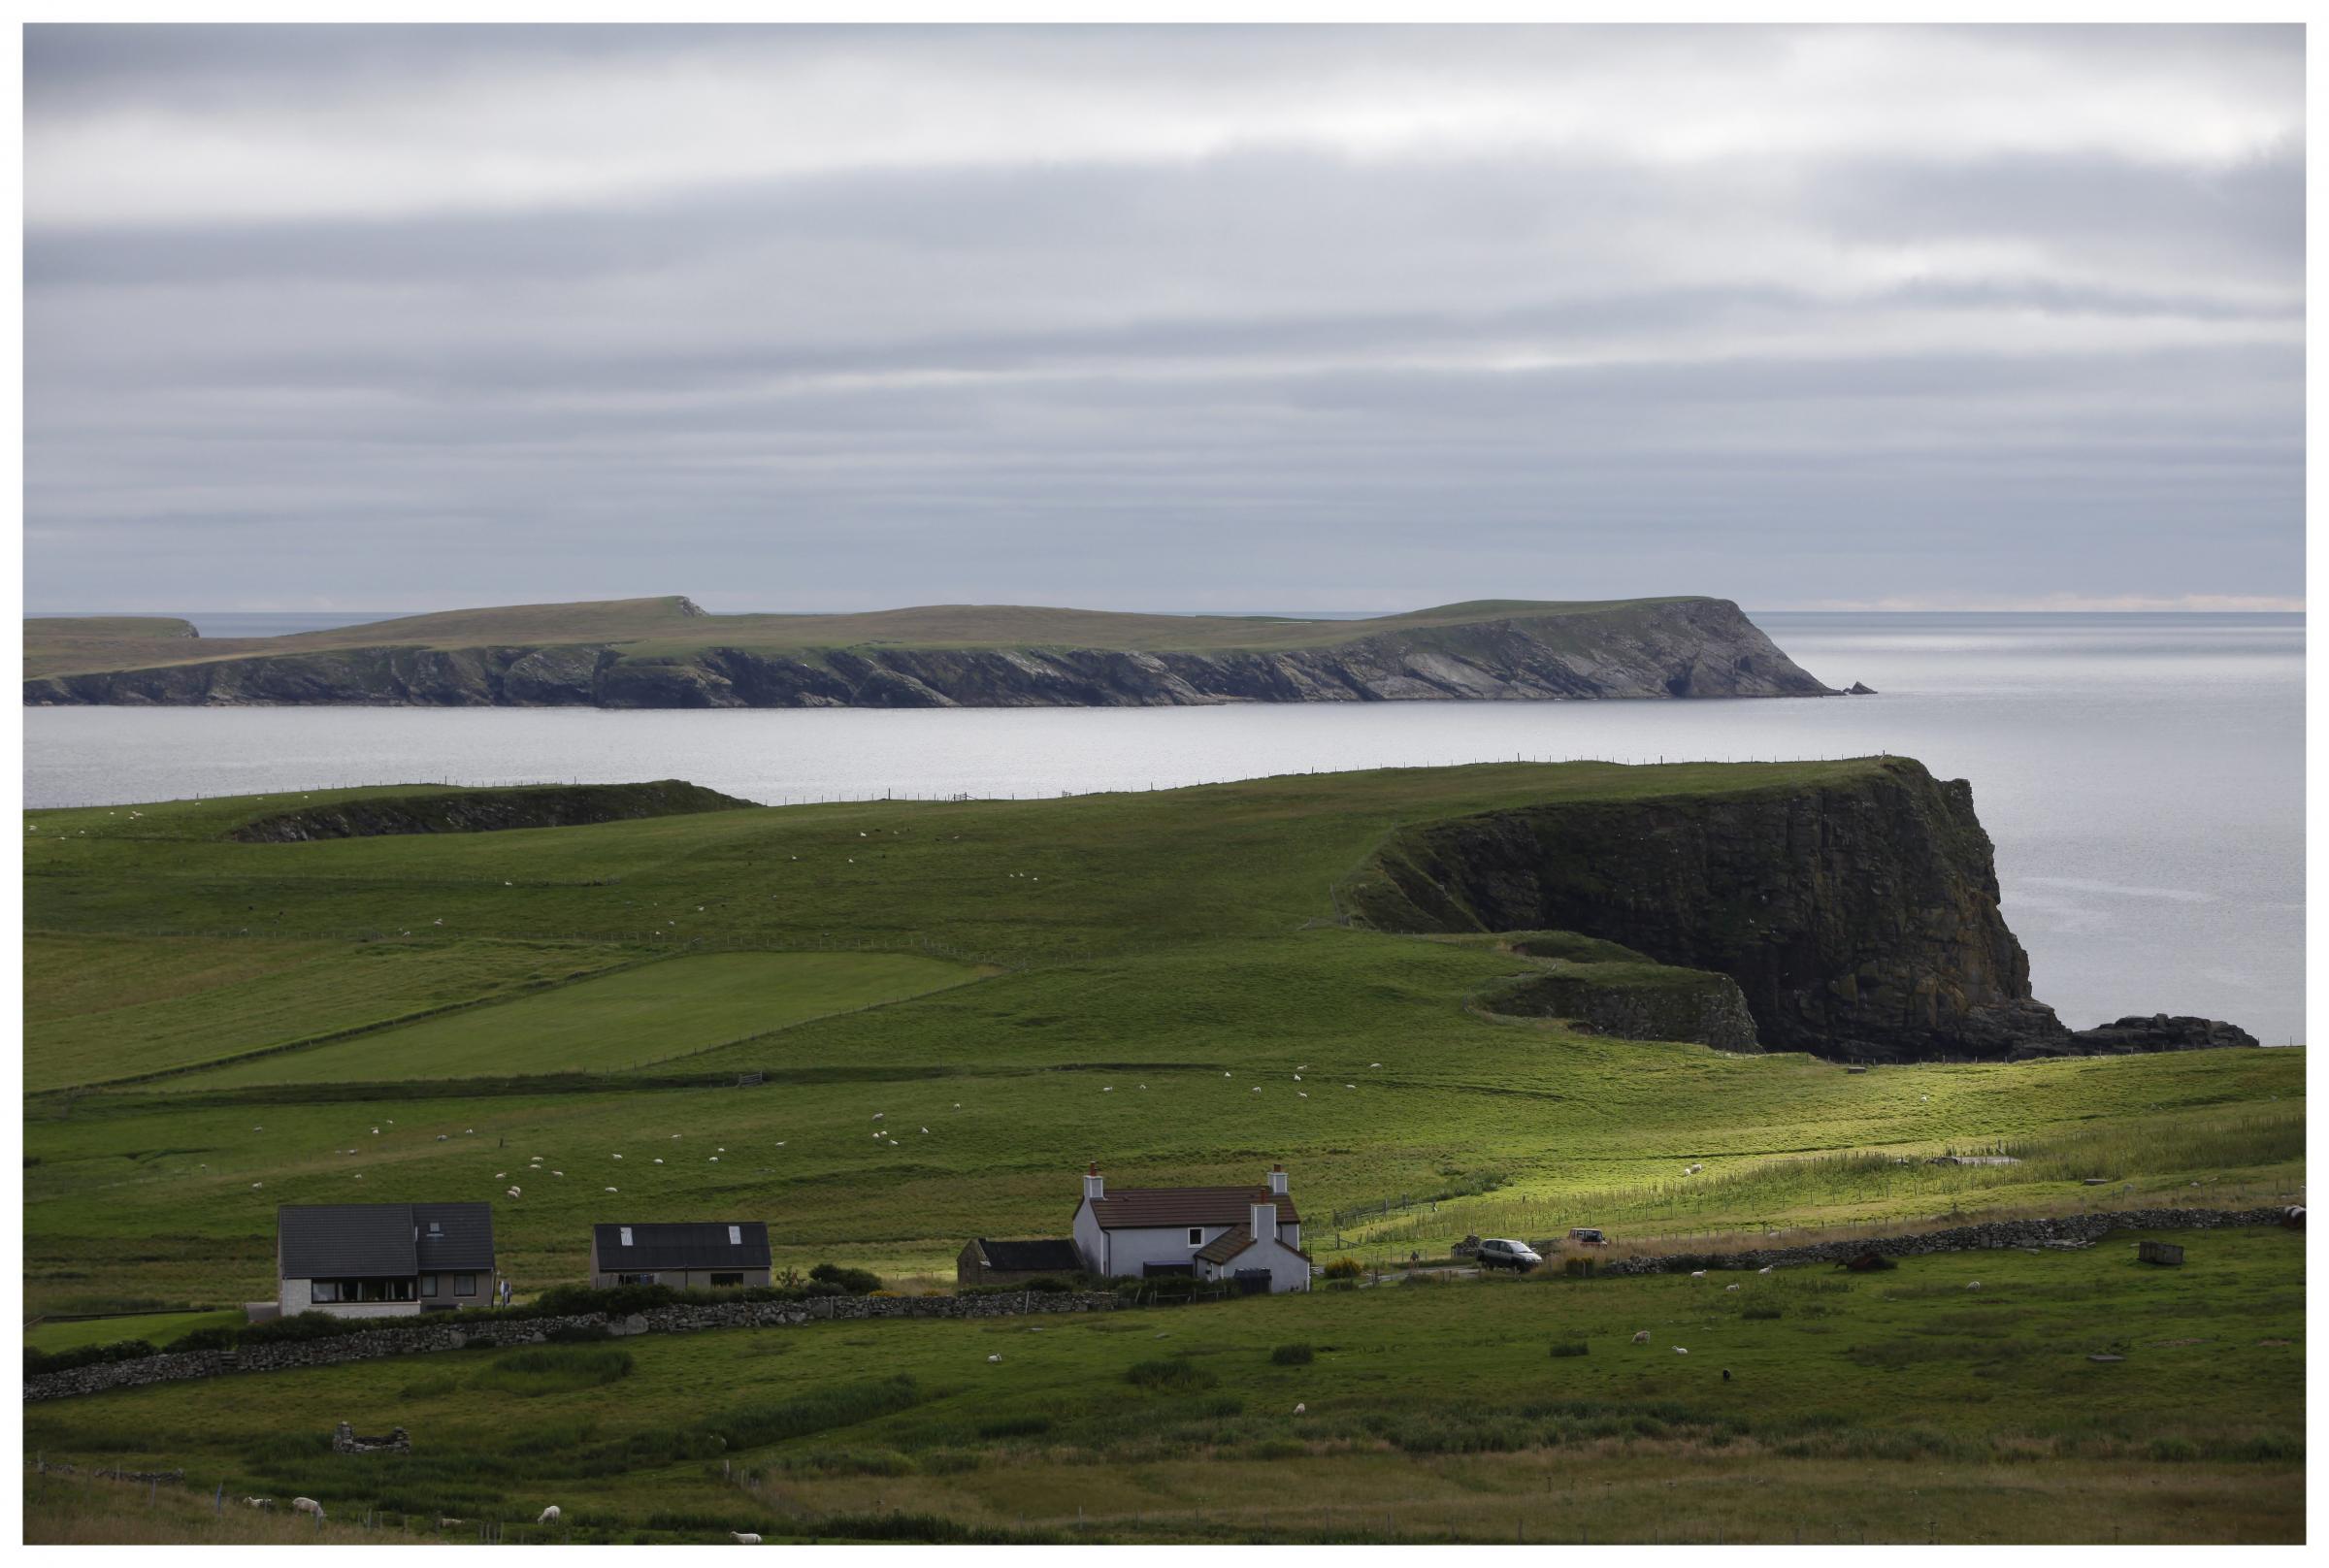 Shetland fiddle player Jenna Reid on her island homeland